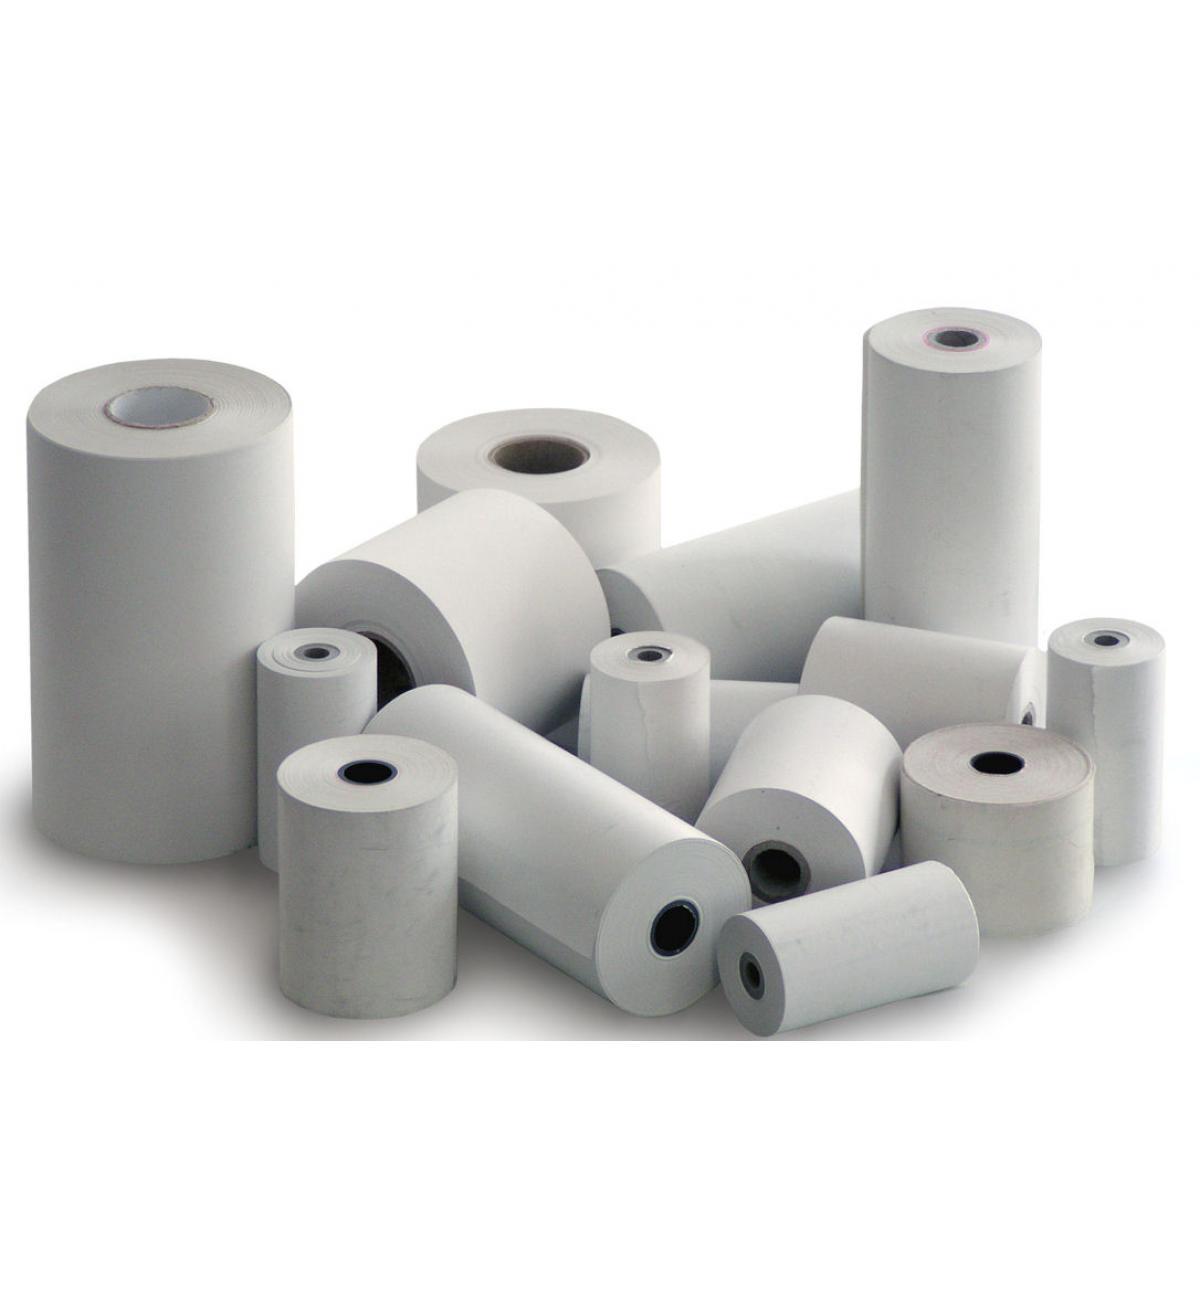 Termopapír šířky 57mm, délka návinu 27m, dutinka 17mm (průměr návinu do 50mm)  10 pack (CHD, 150TE)